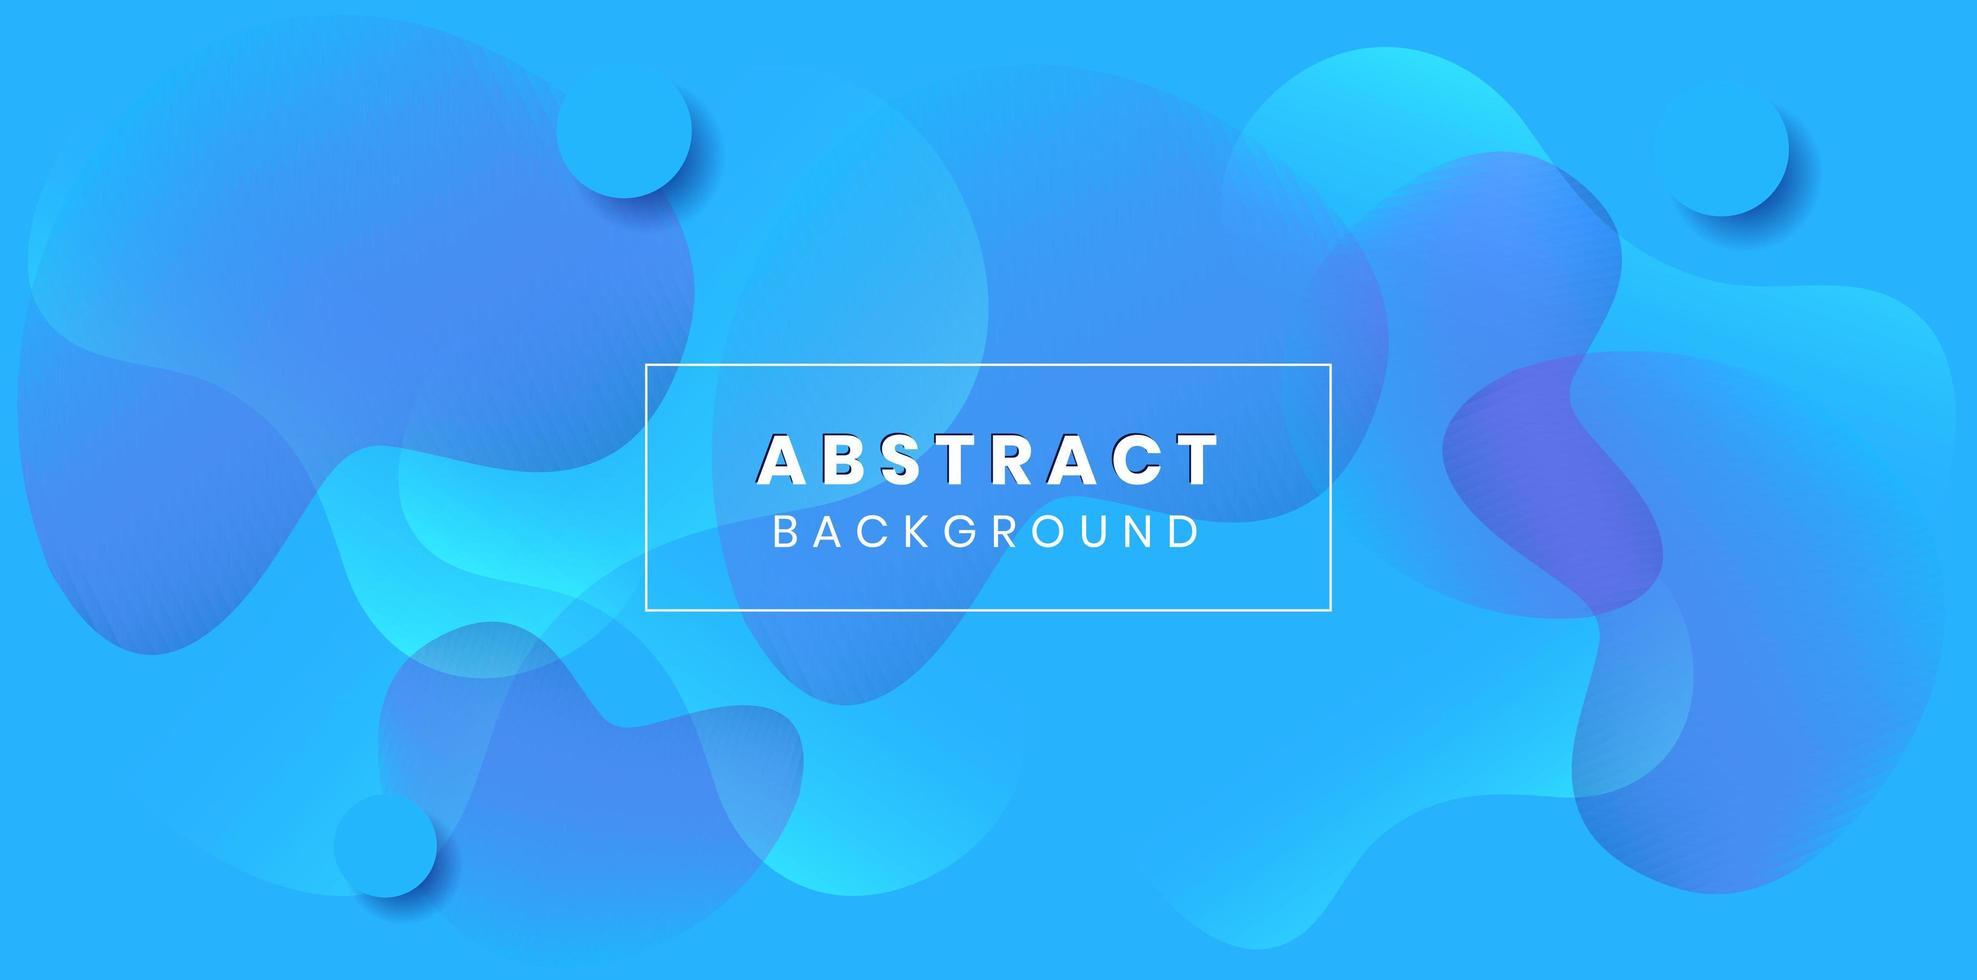 Vektor-abstrakter Kreismuster Hintergrund vektor